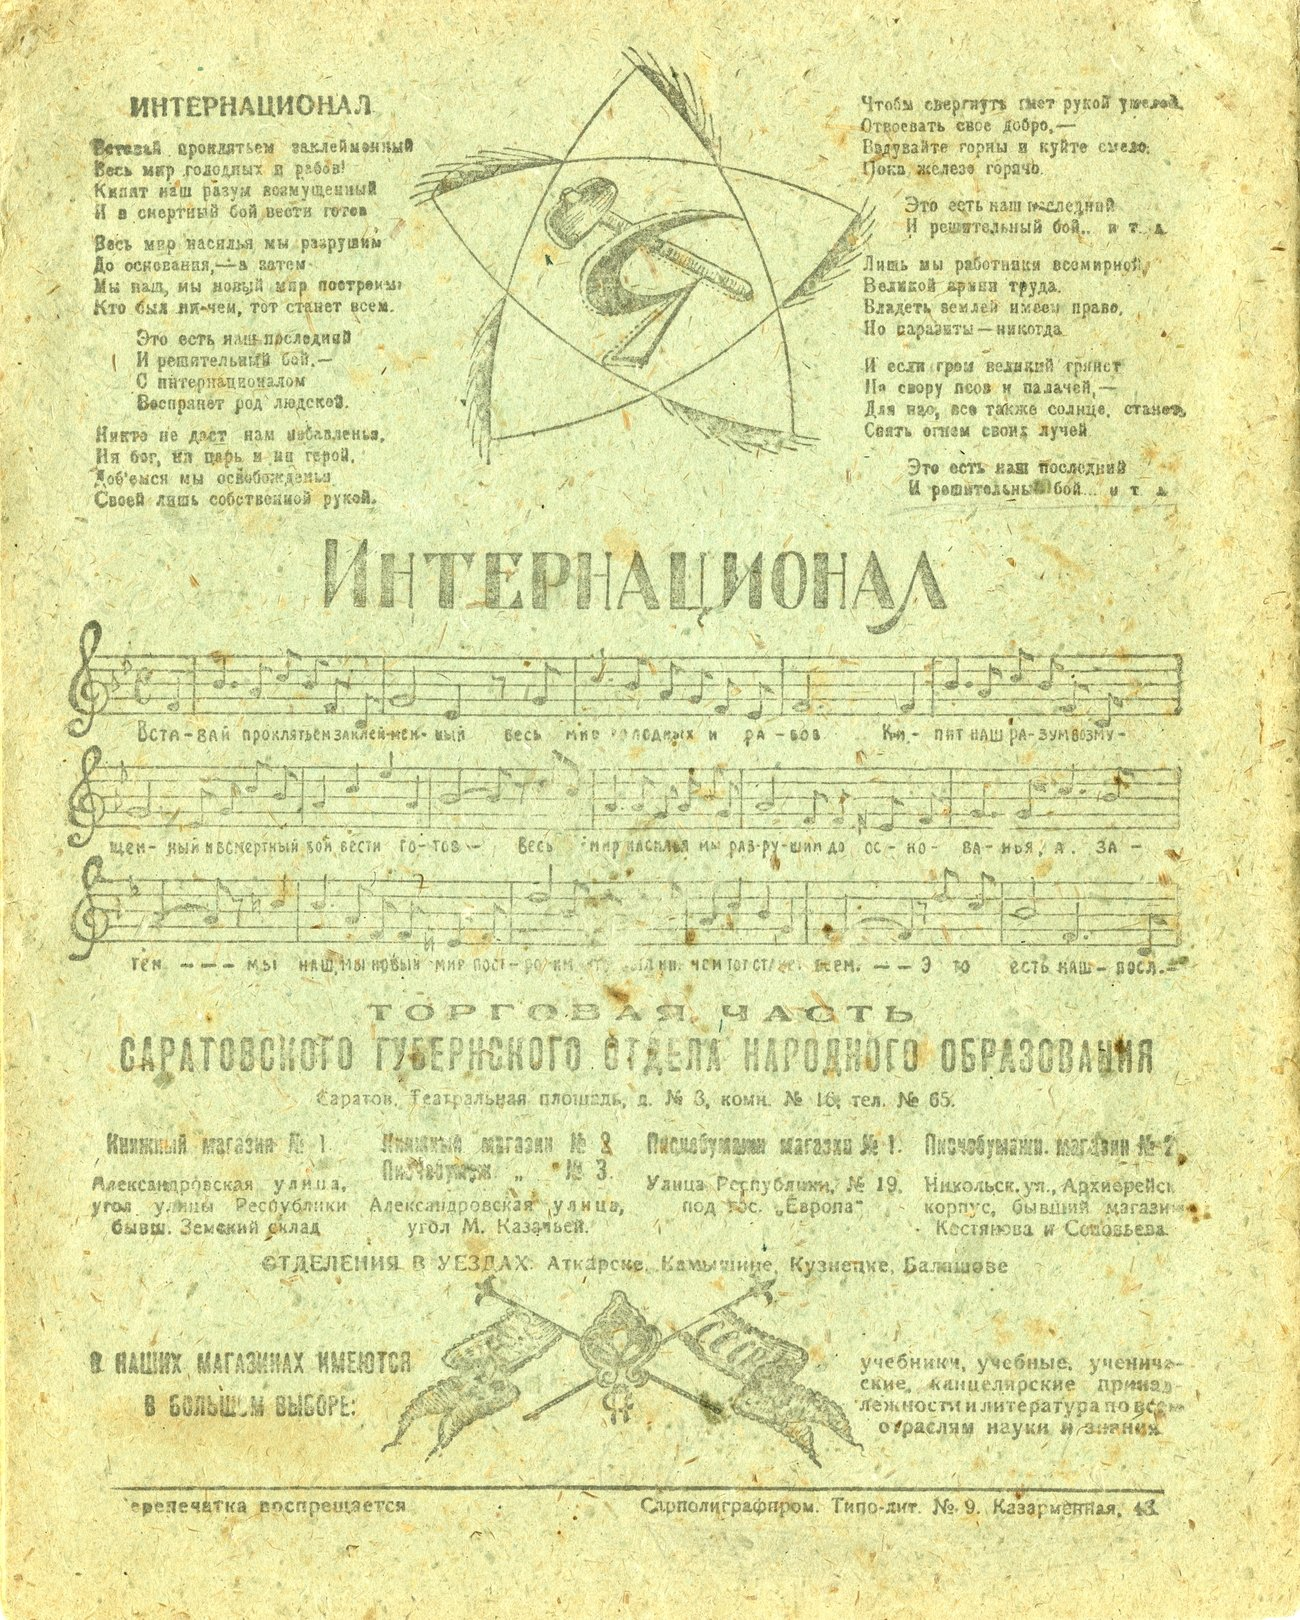 Тетрадь 1928 Губоно Саратов оборот